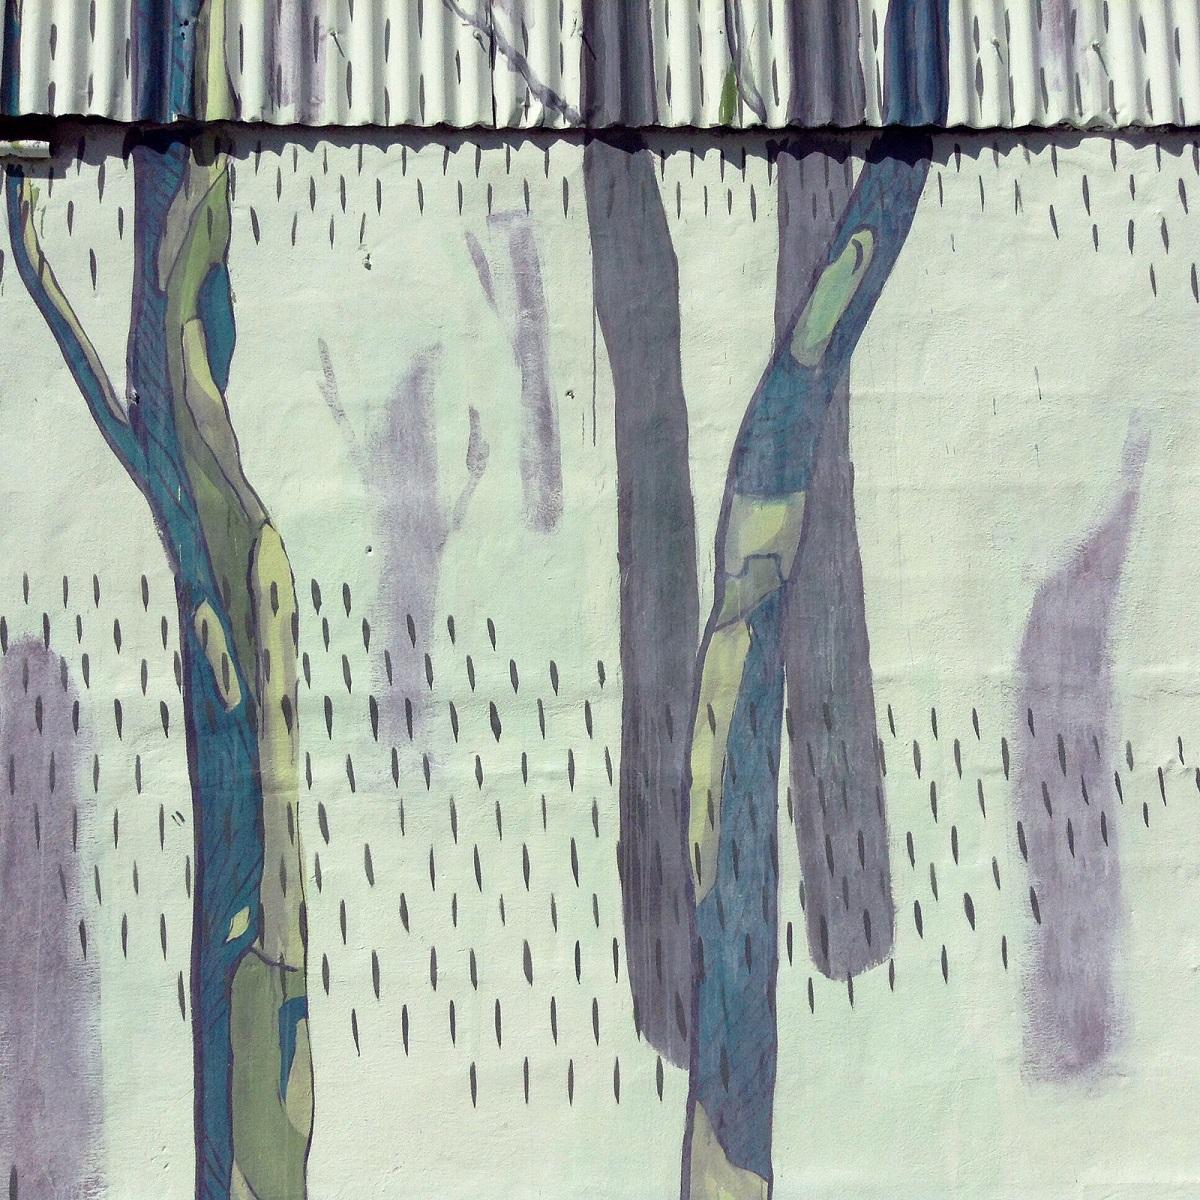 pastel-new-mural-in-cordoba-argentina-03